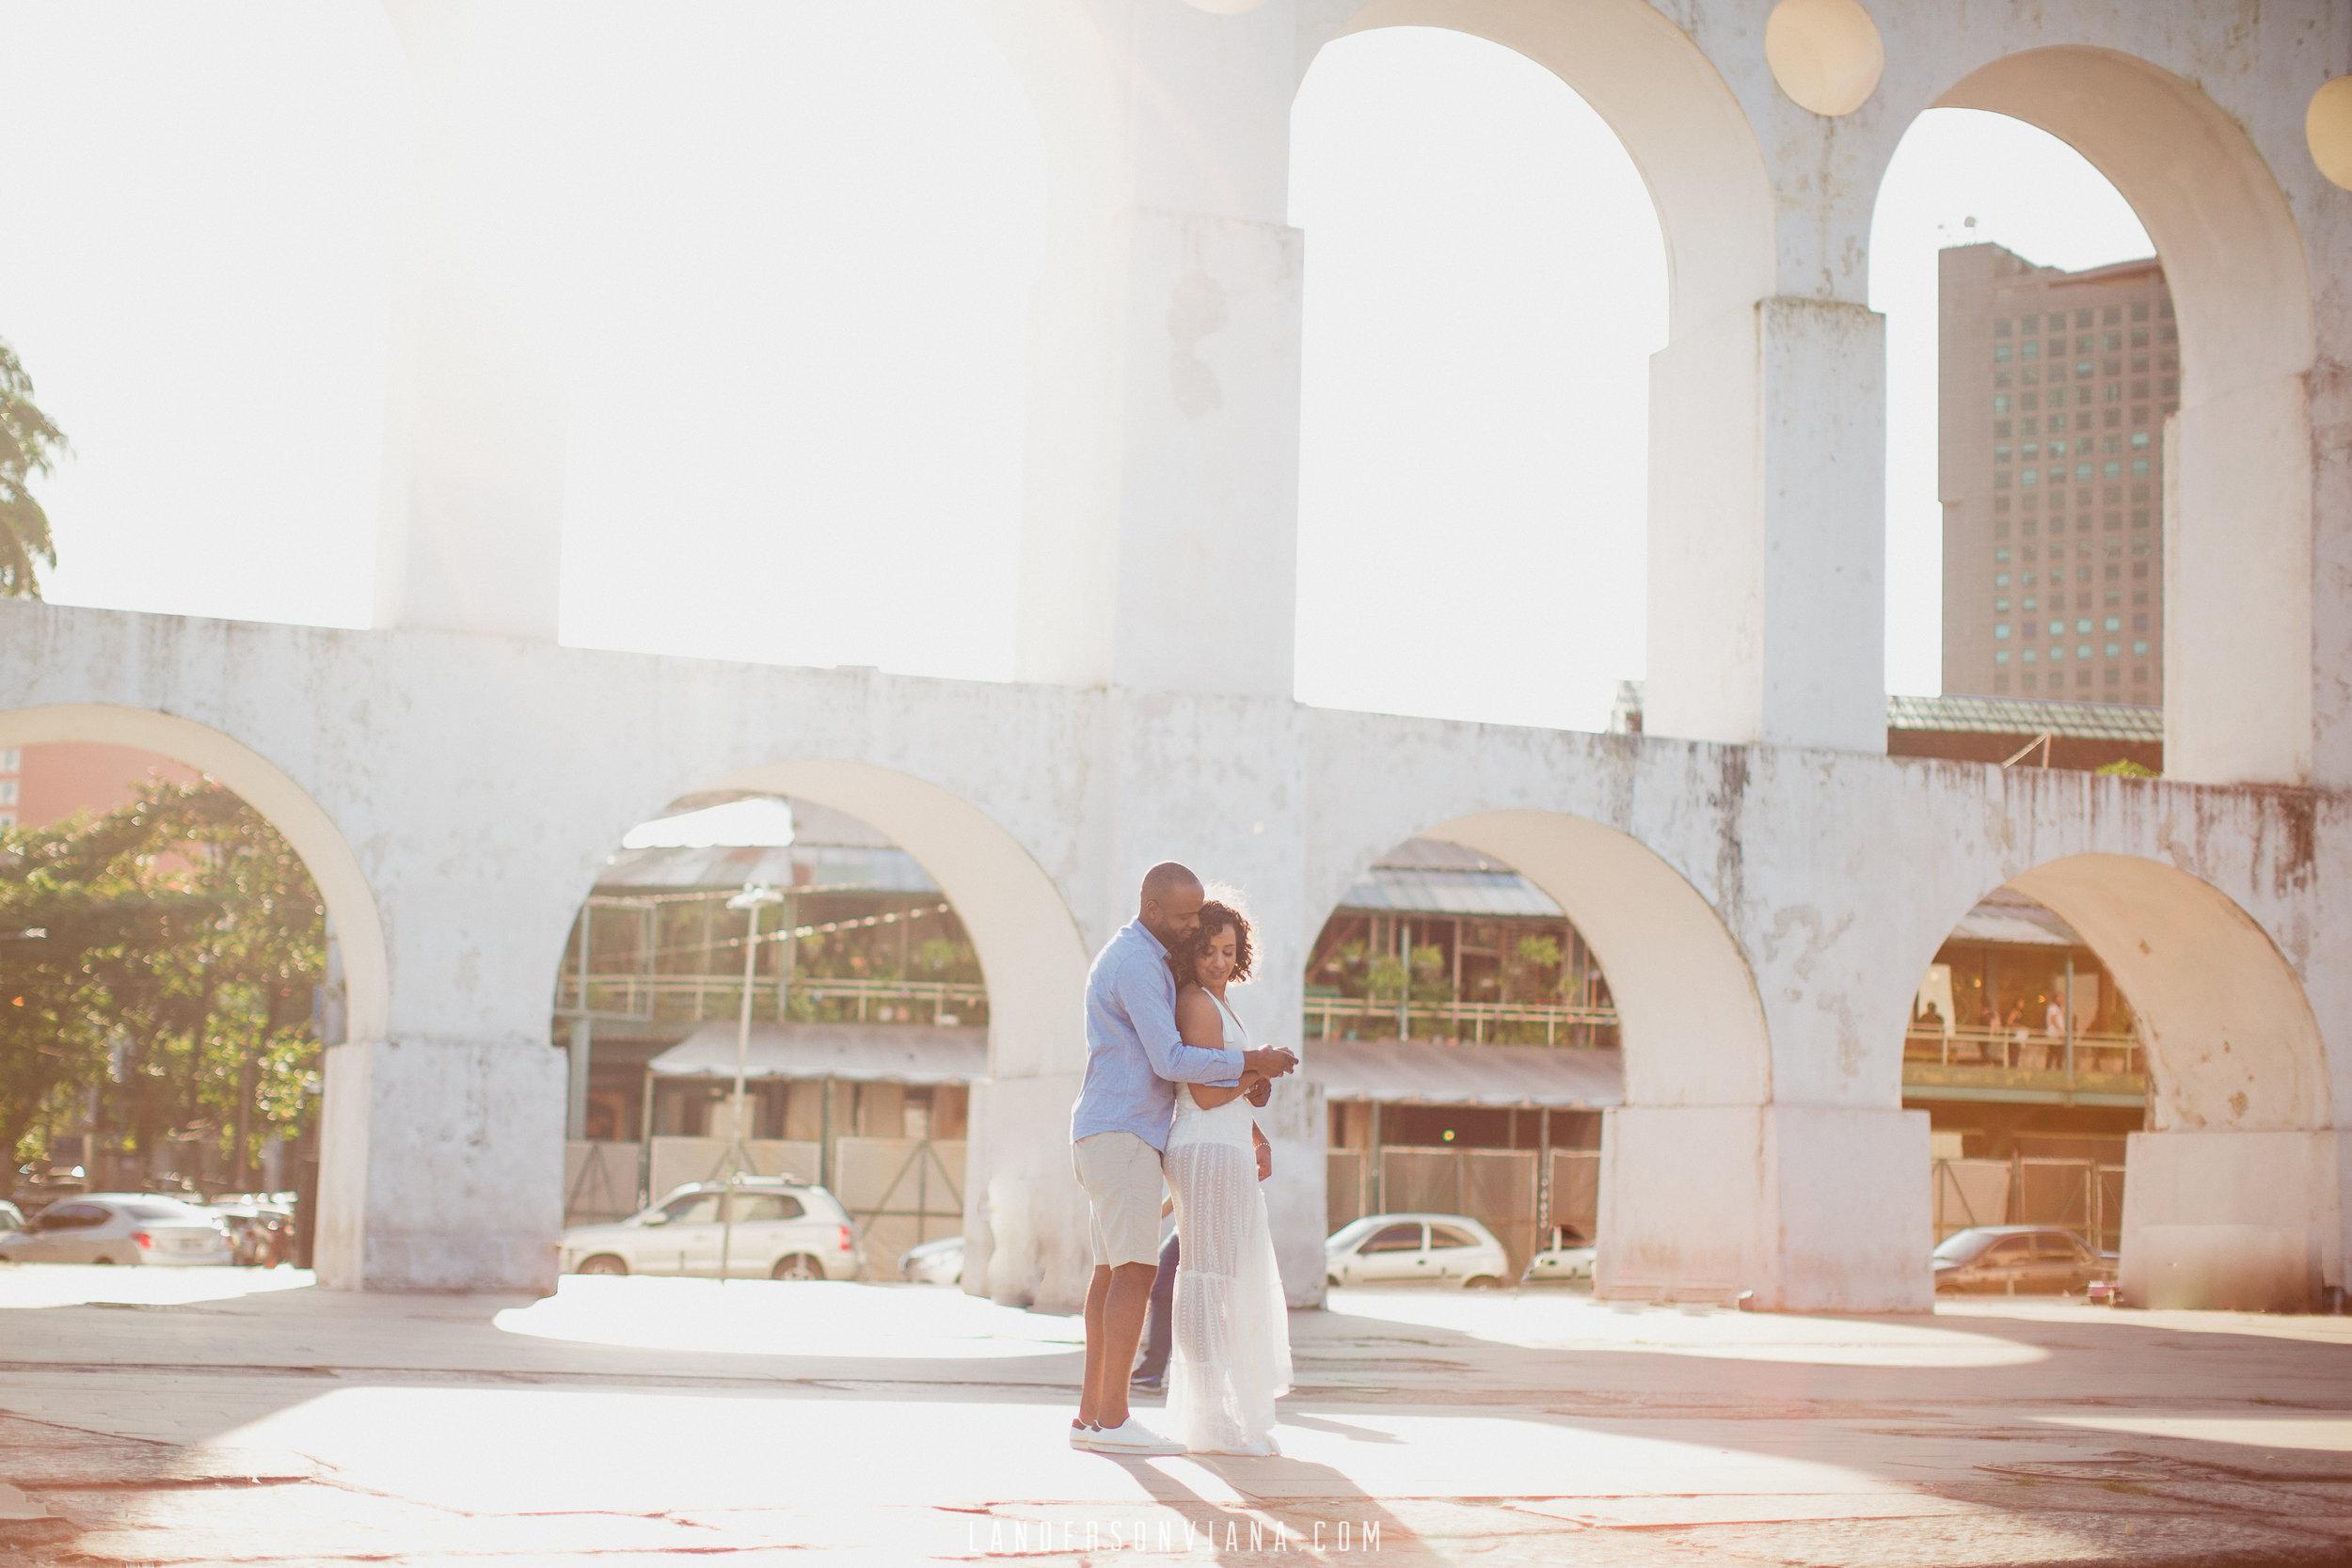 ensaio_fotografico_pre_casamento_rio_de_janeiro.jpg